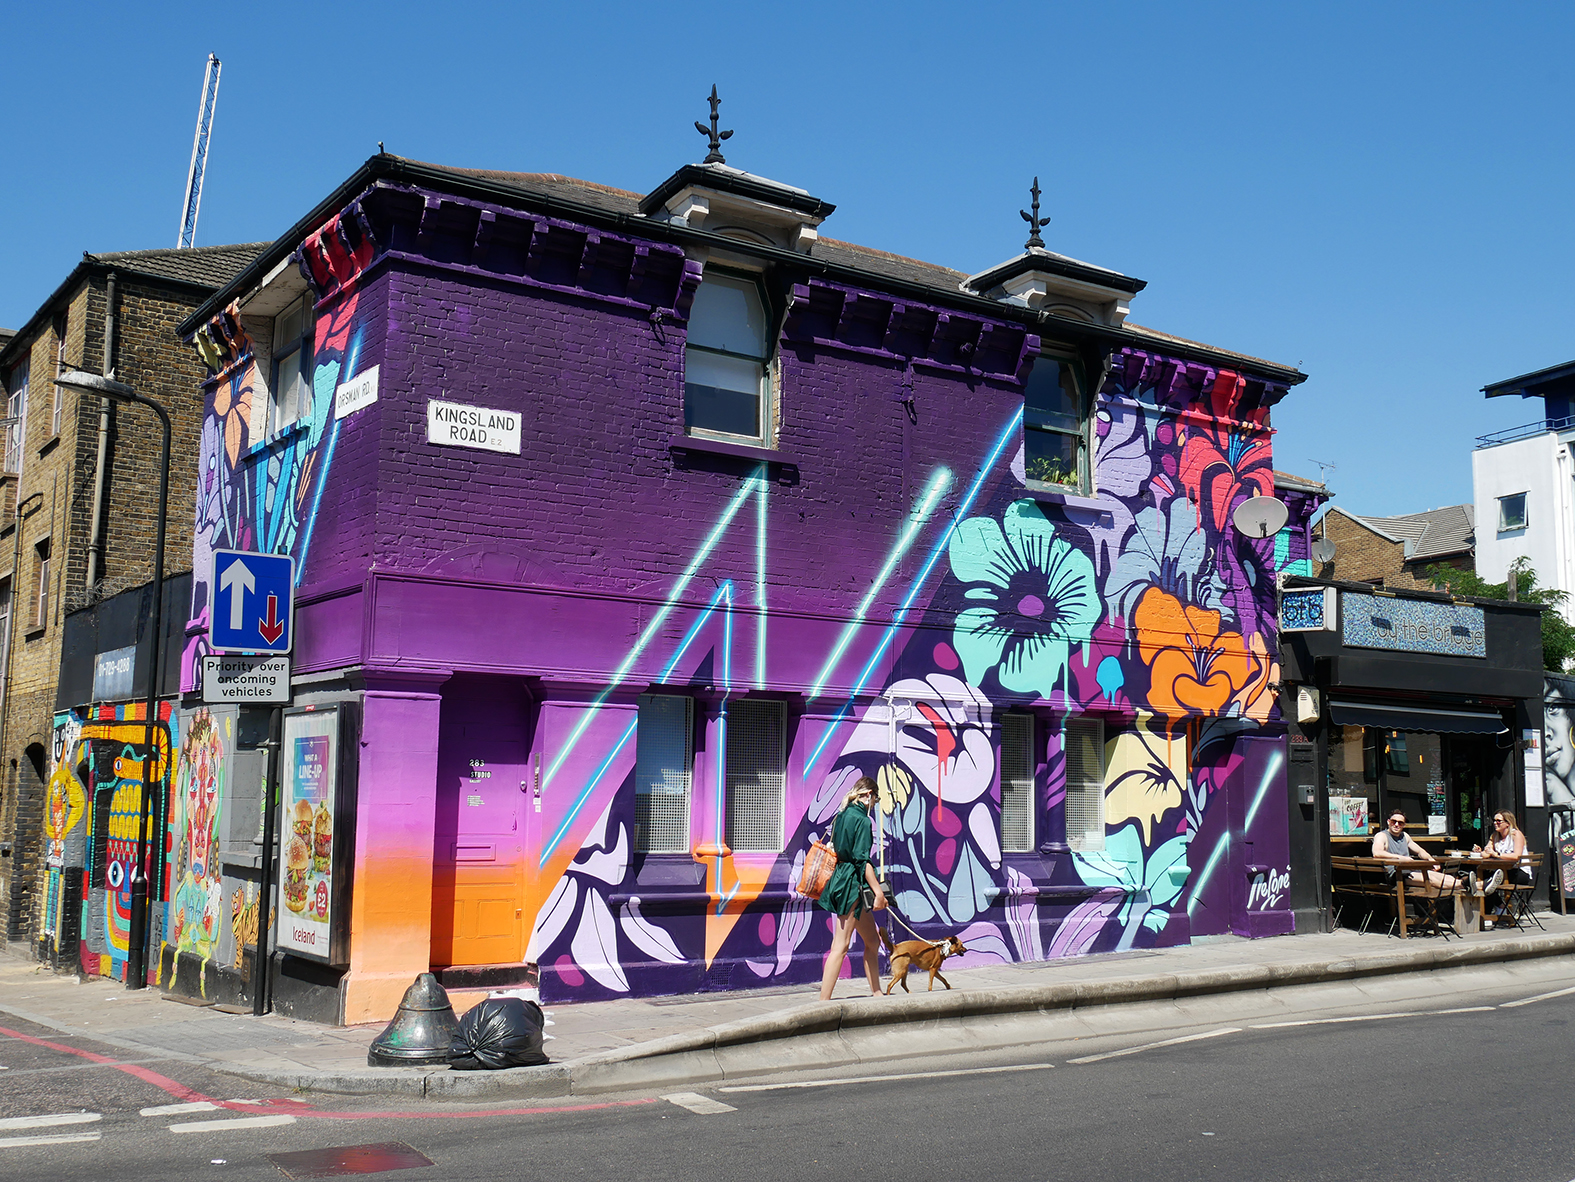 Nerone-olly-gallery-street-art-1